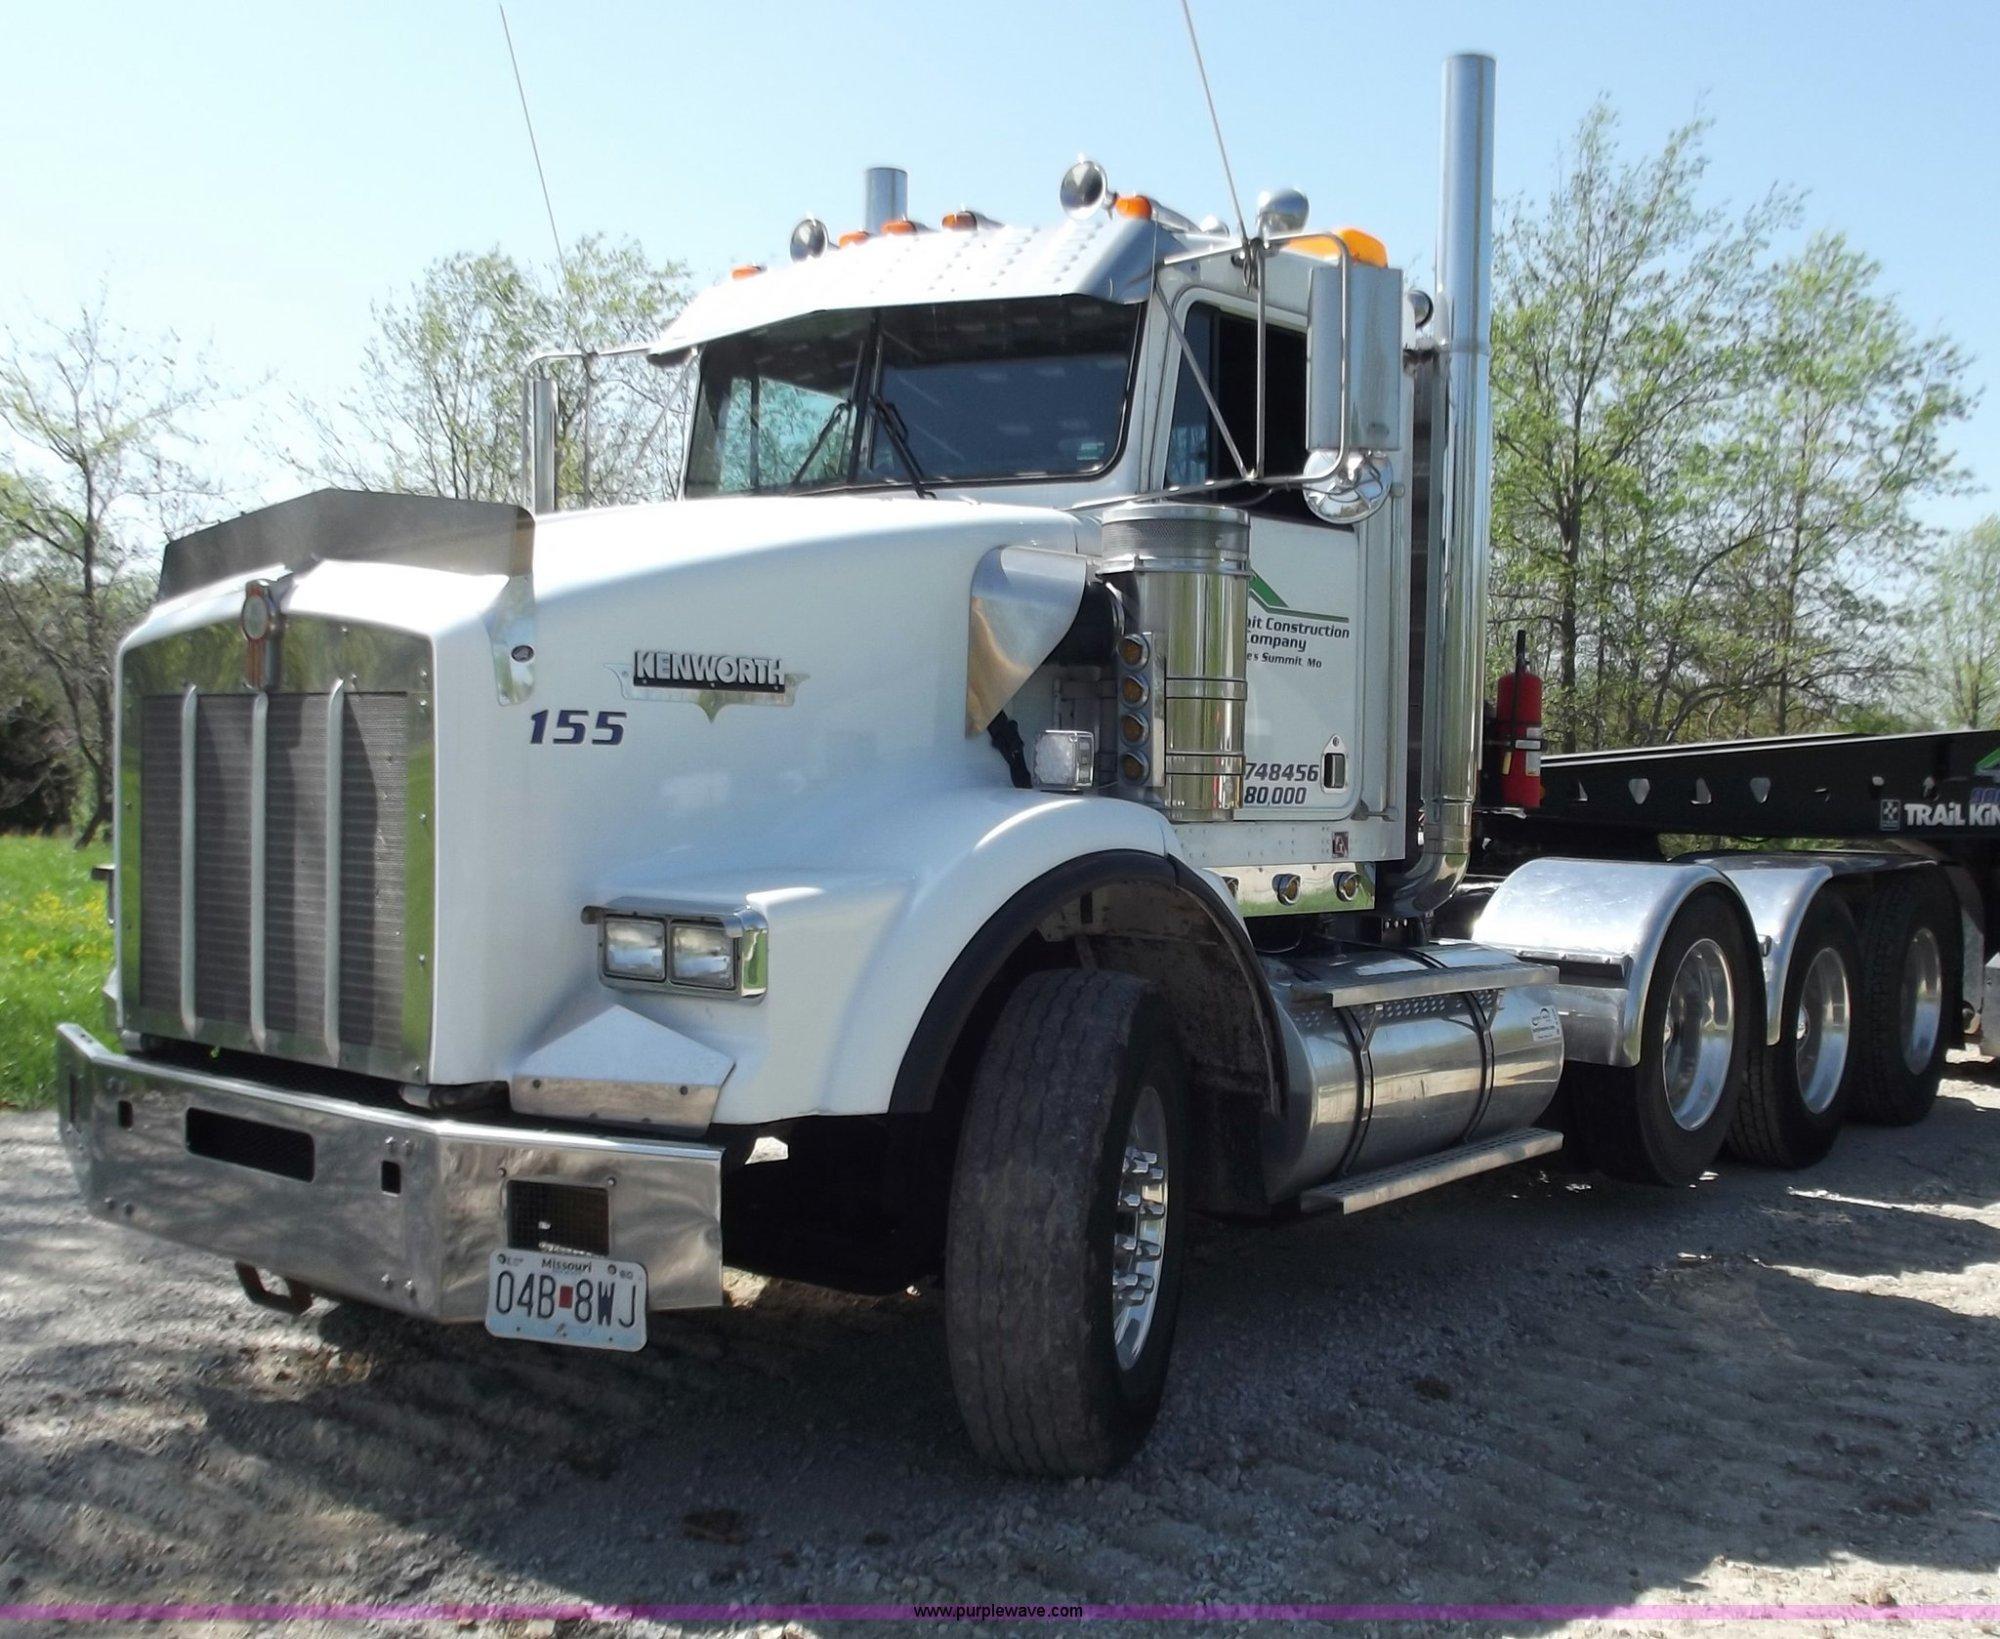 hight resolution of b6326 image for item b6326 1999 kenworth t800 triple axle semi truck